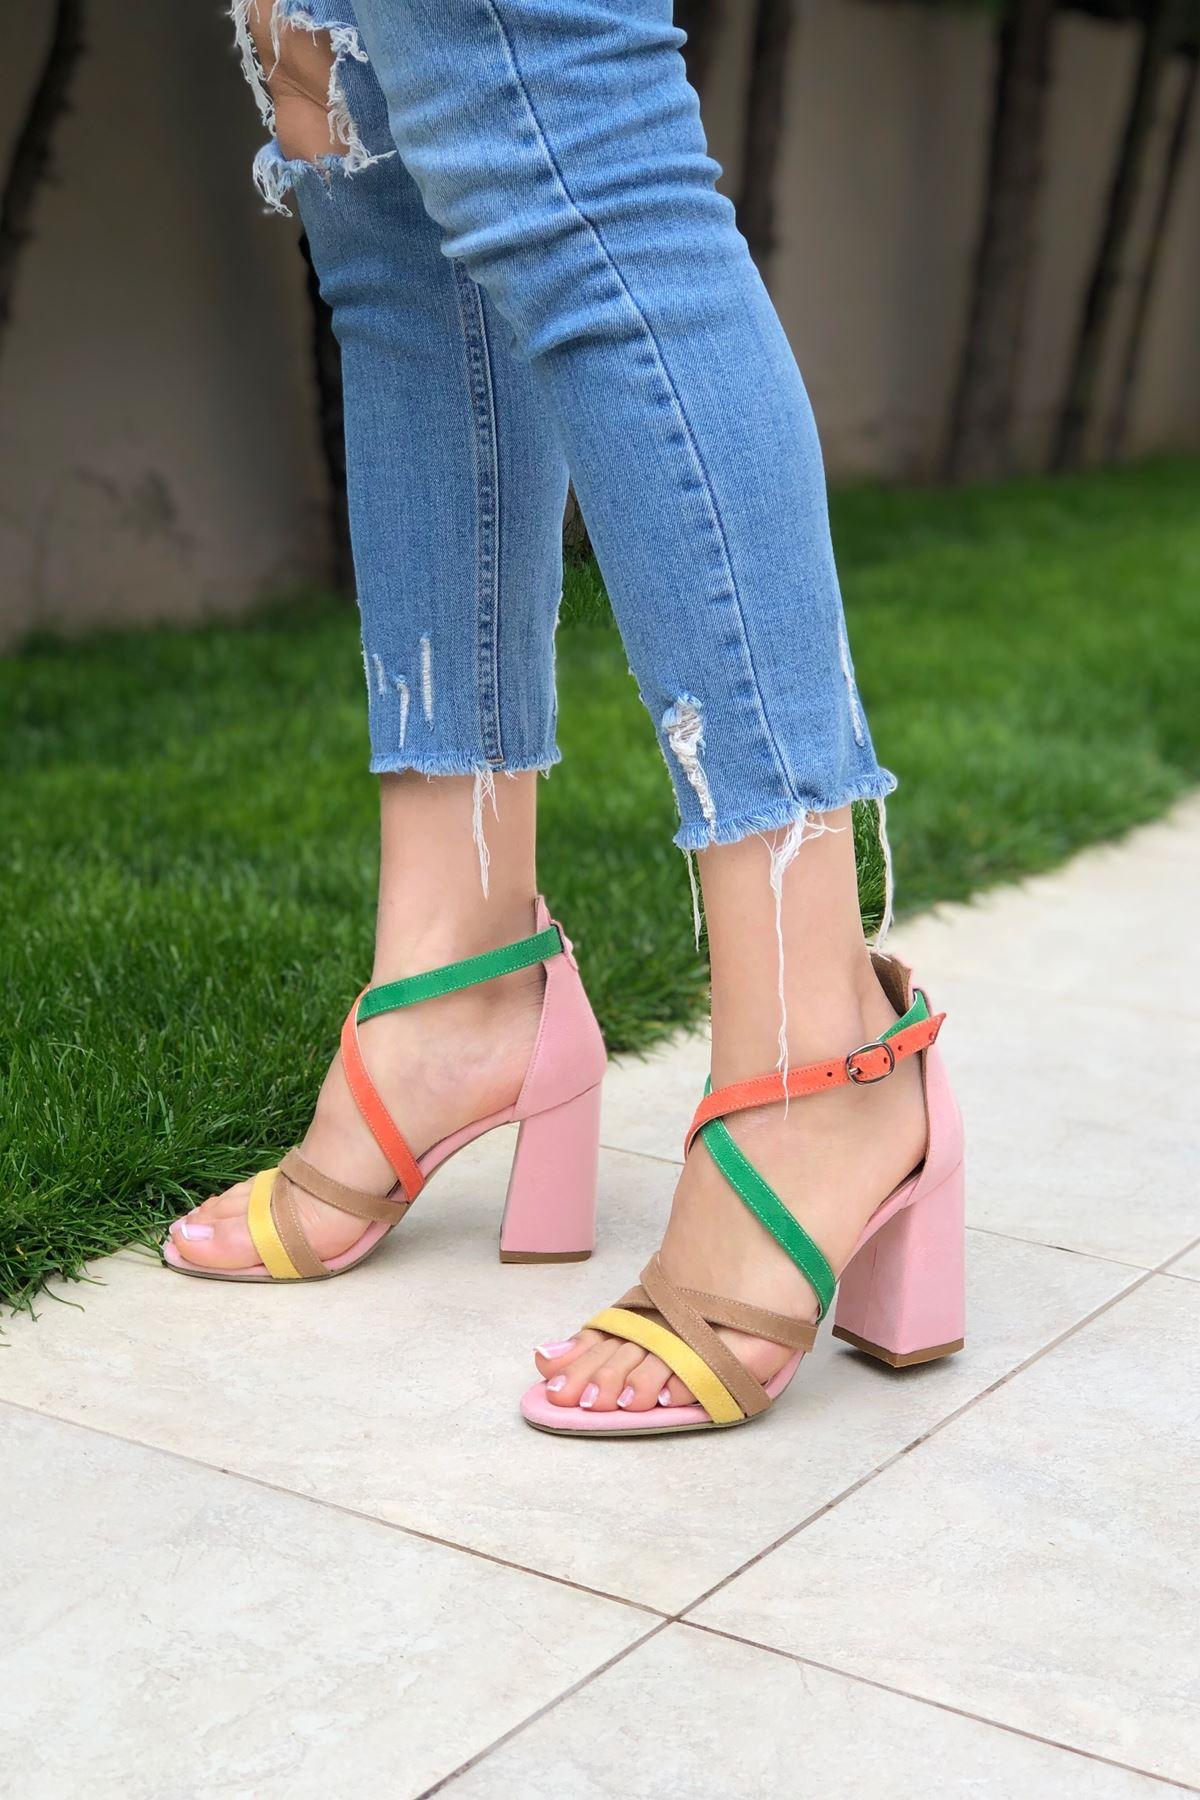 Pembe Süet Renkli Topuklu Ayakkabı